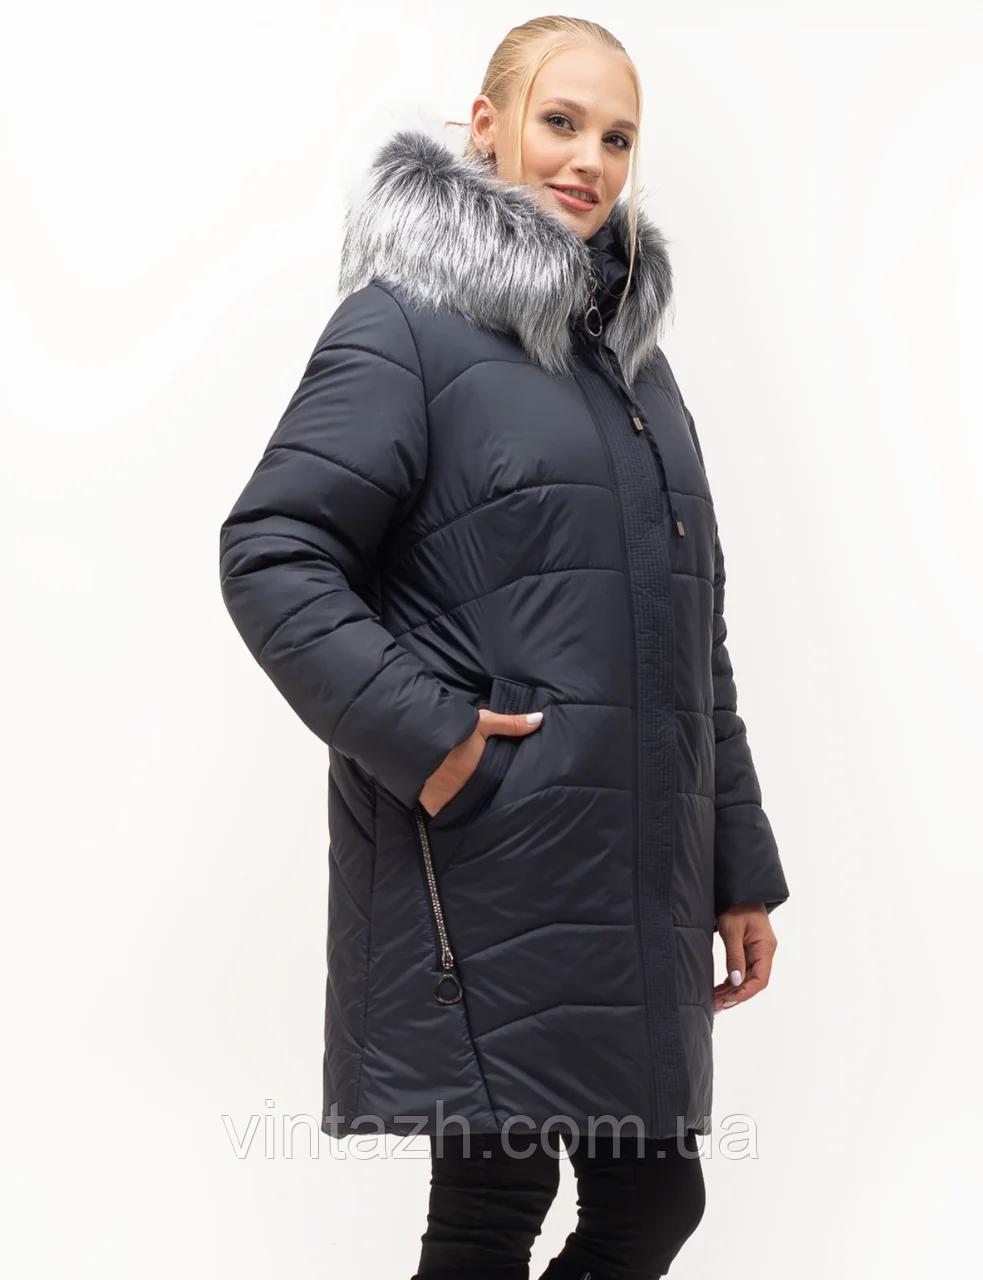 Женская зимняя куртка размеры 54-70